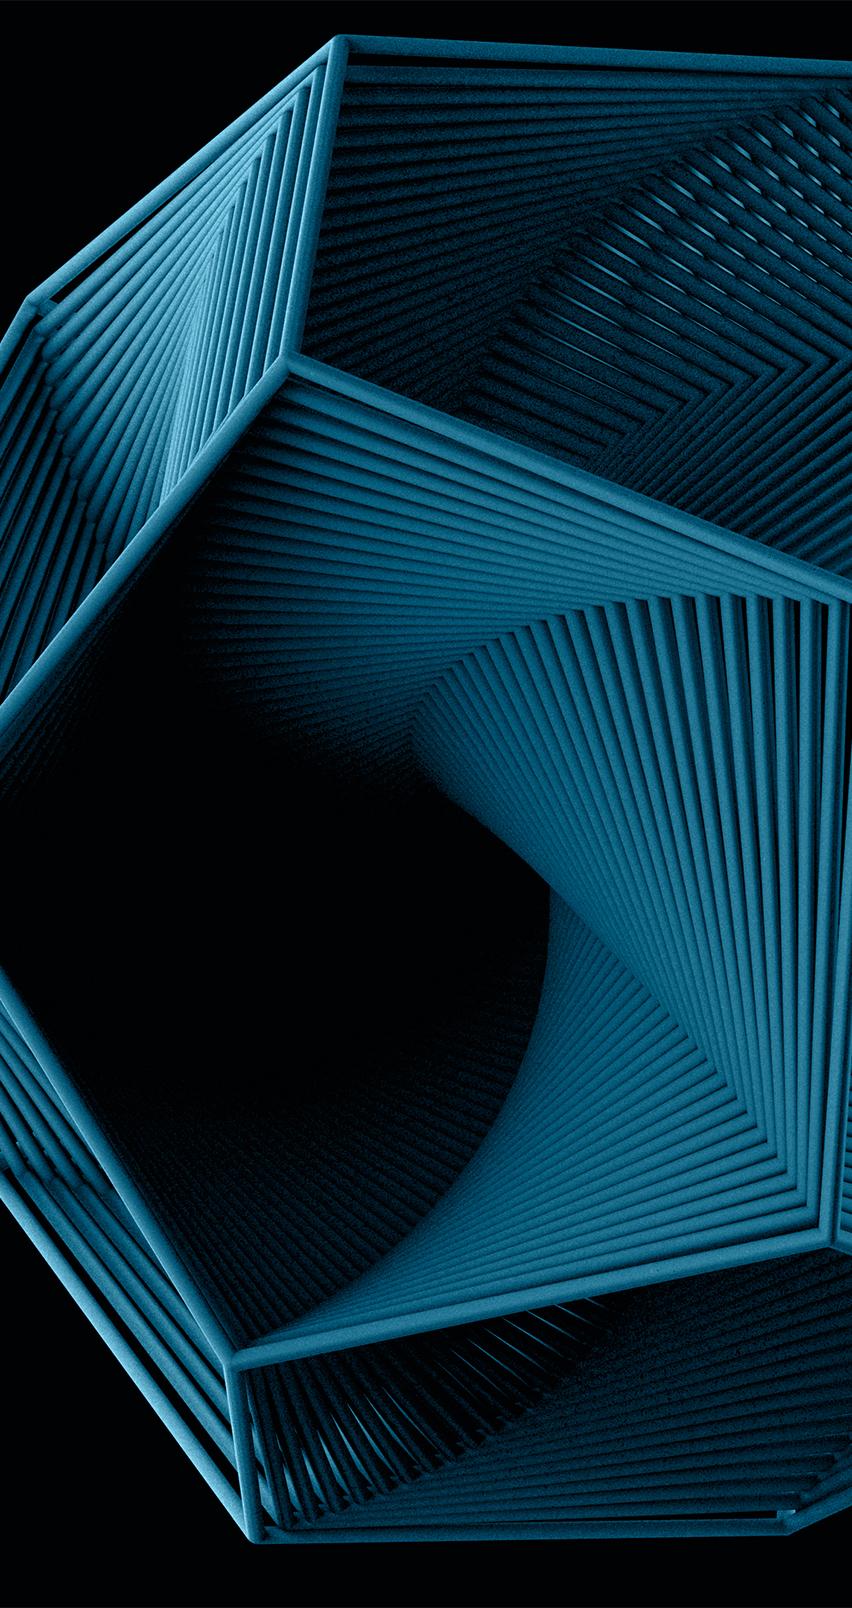 Geometric Outbreak design wallpapers